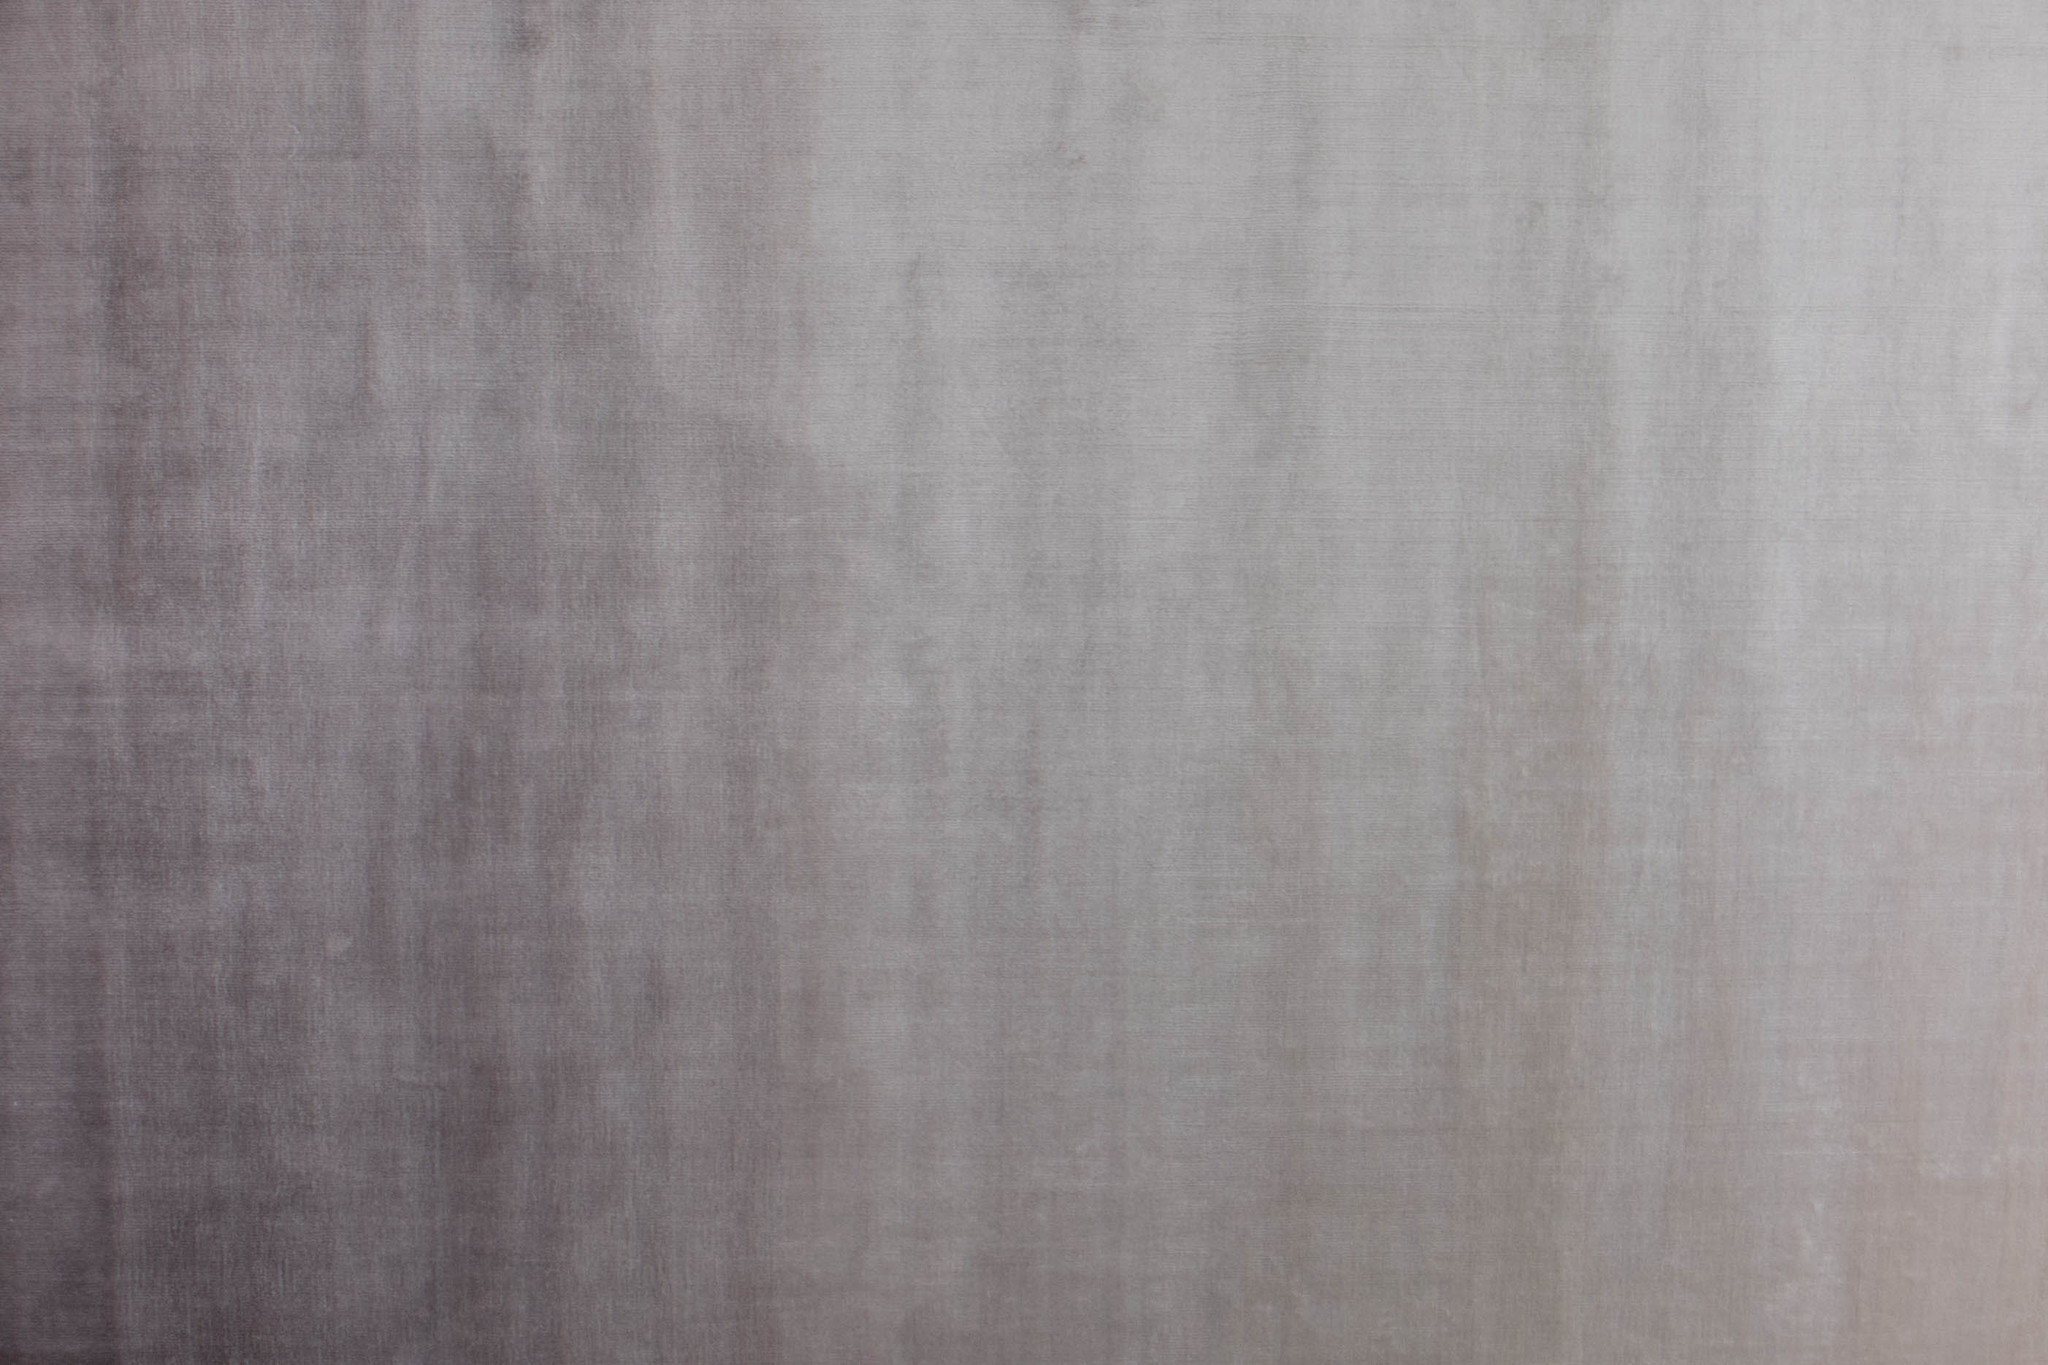 UMBRIA Carpet Champagne Fade 200x300-1